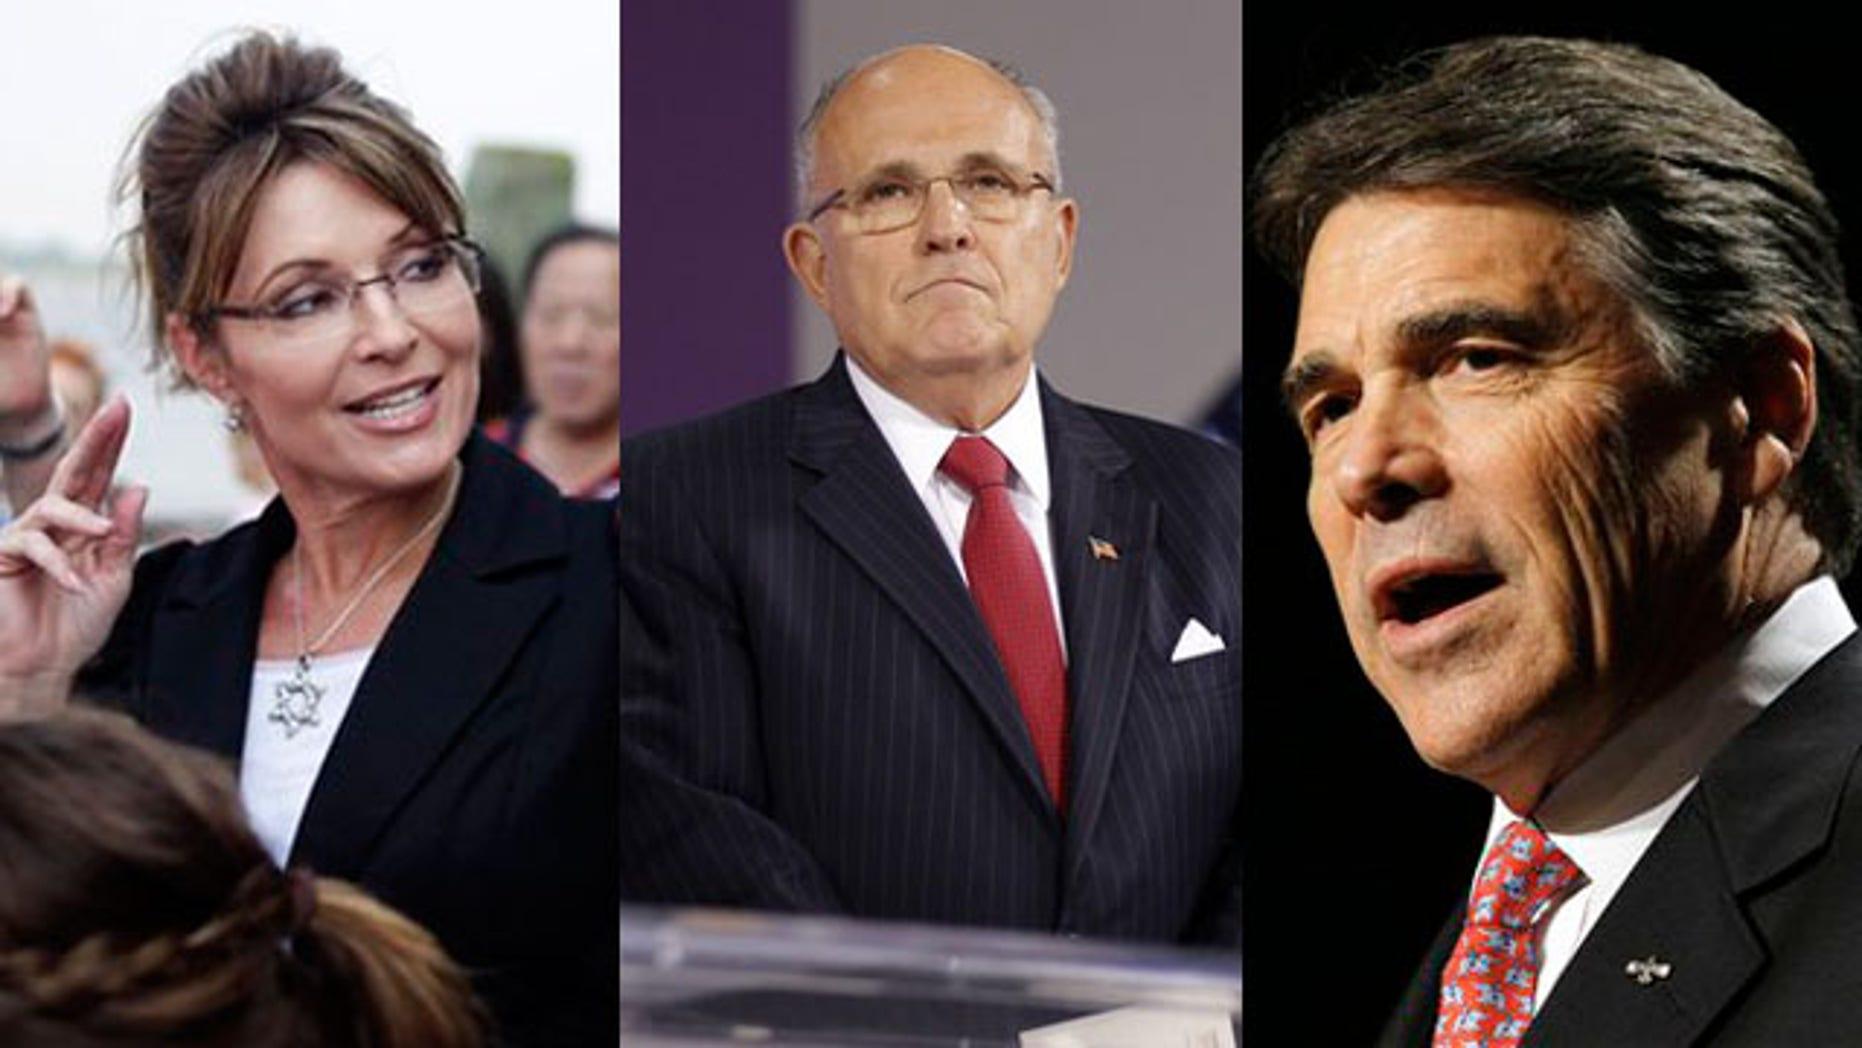 Shown here are former Alaska Gov. Sarah Palin, left, former New York City Mayor Rudy Giuliani, center, and Texas Gov. Rick Perry.